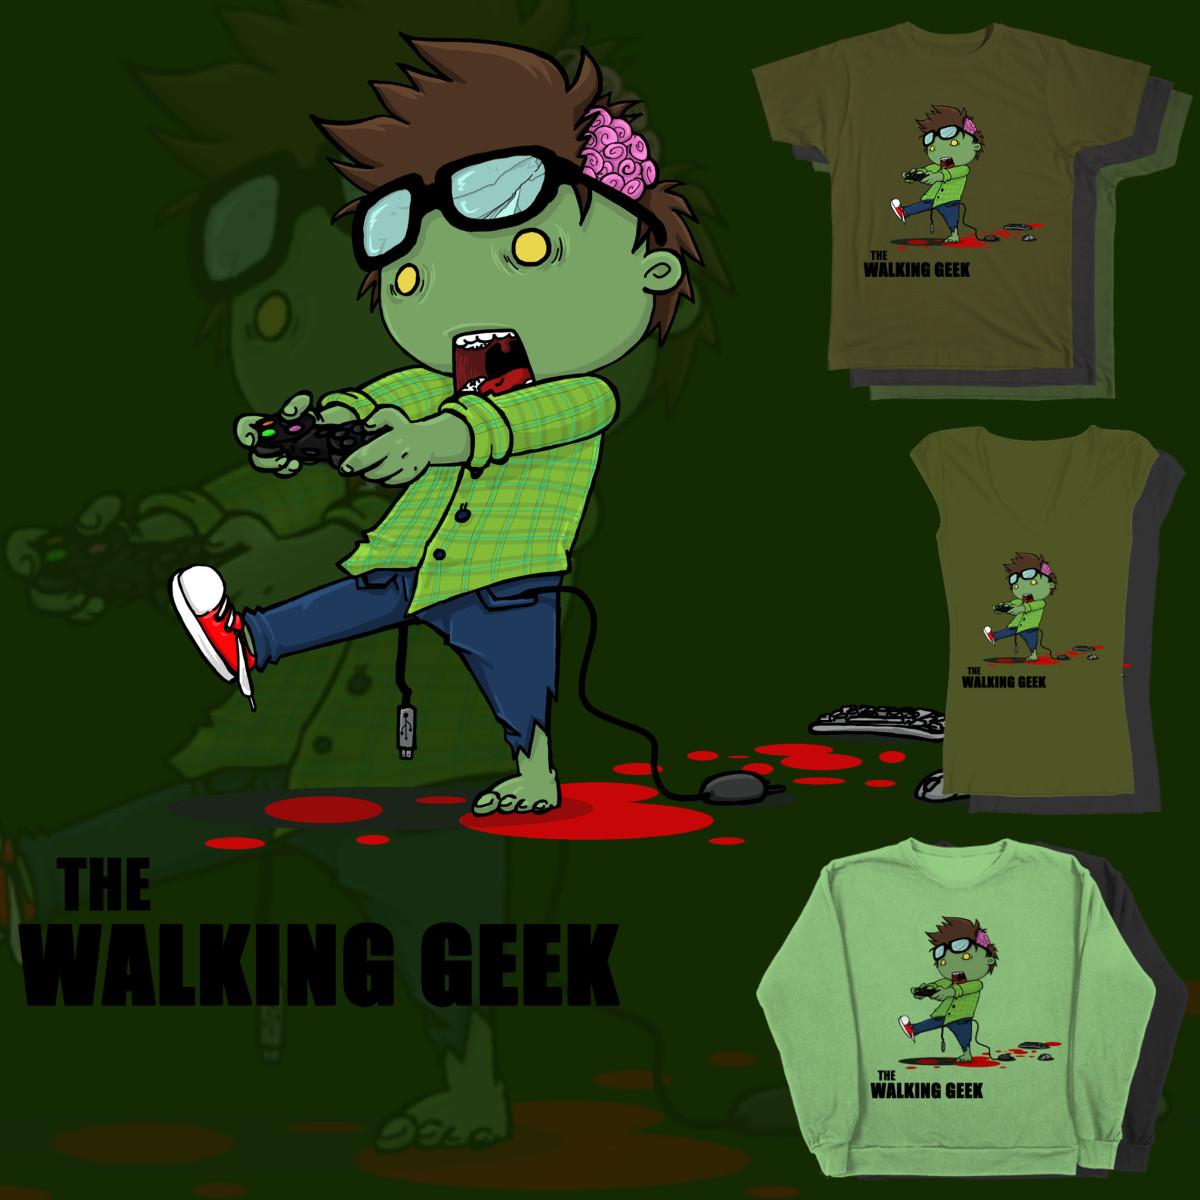 The Walking Geek by DandyAnge on Threadless